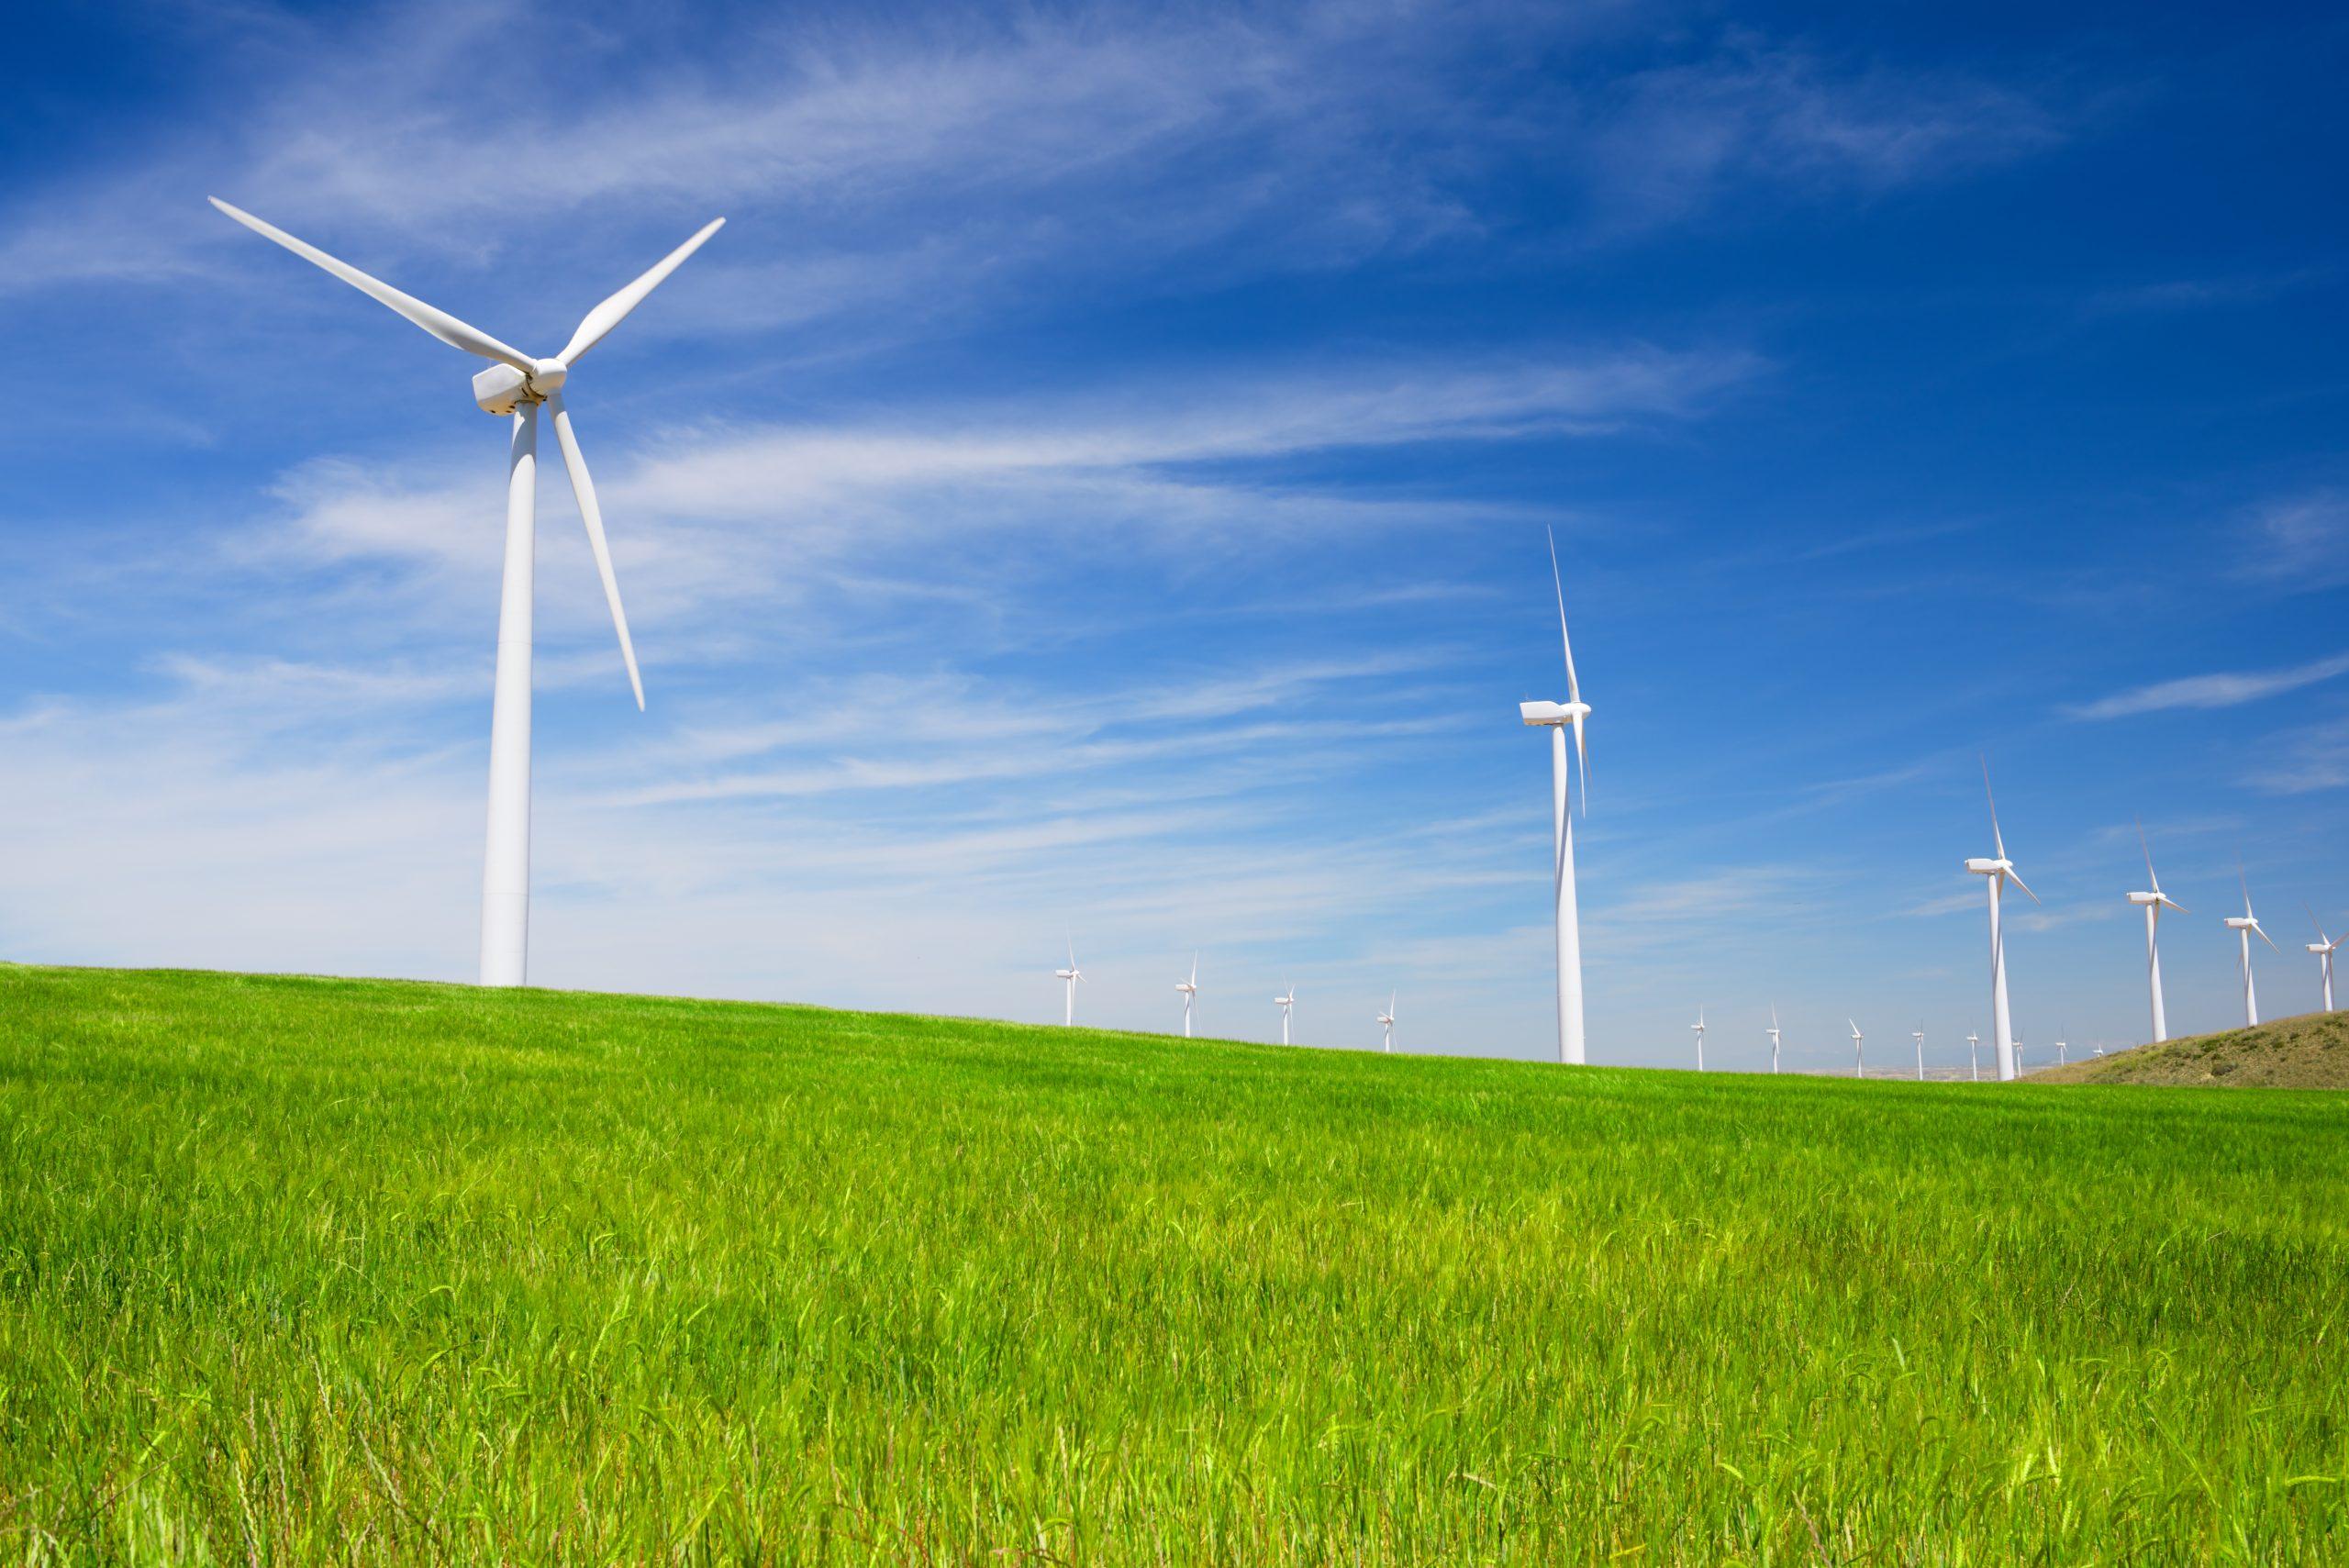 Windmills for electric power production, Zaragoza province, Aragon, Spain